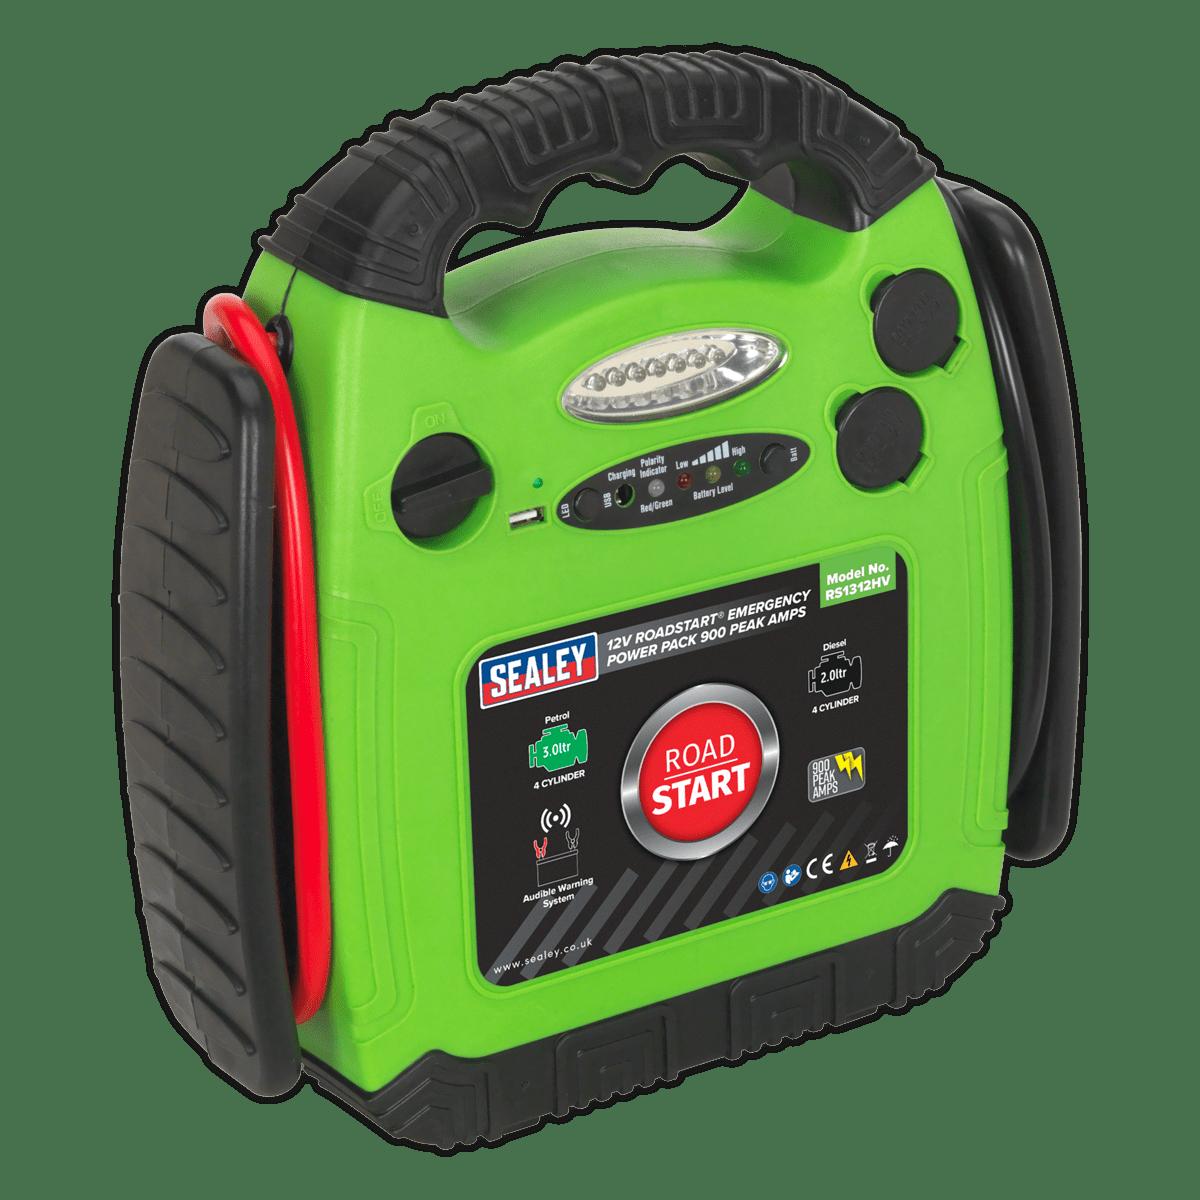 Sealey RoadStart® Emergency Jump Starter 12V 900 Peak Amps Hi-Vis Green RS1312HV | Composite hi-vis green case with moulded rubber protection, integral battery cable storage and carry handle. | toolforce.ie